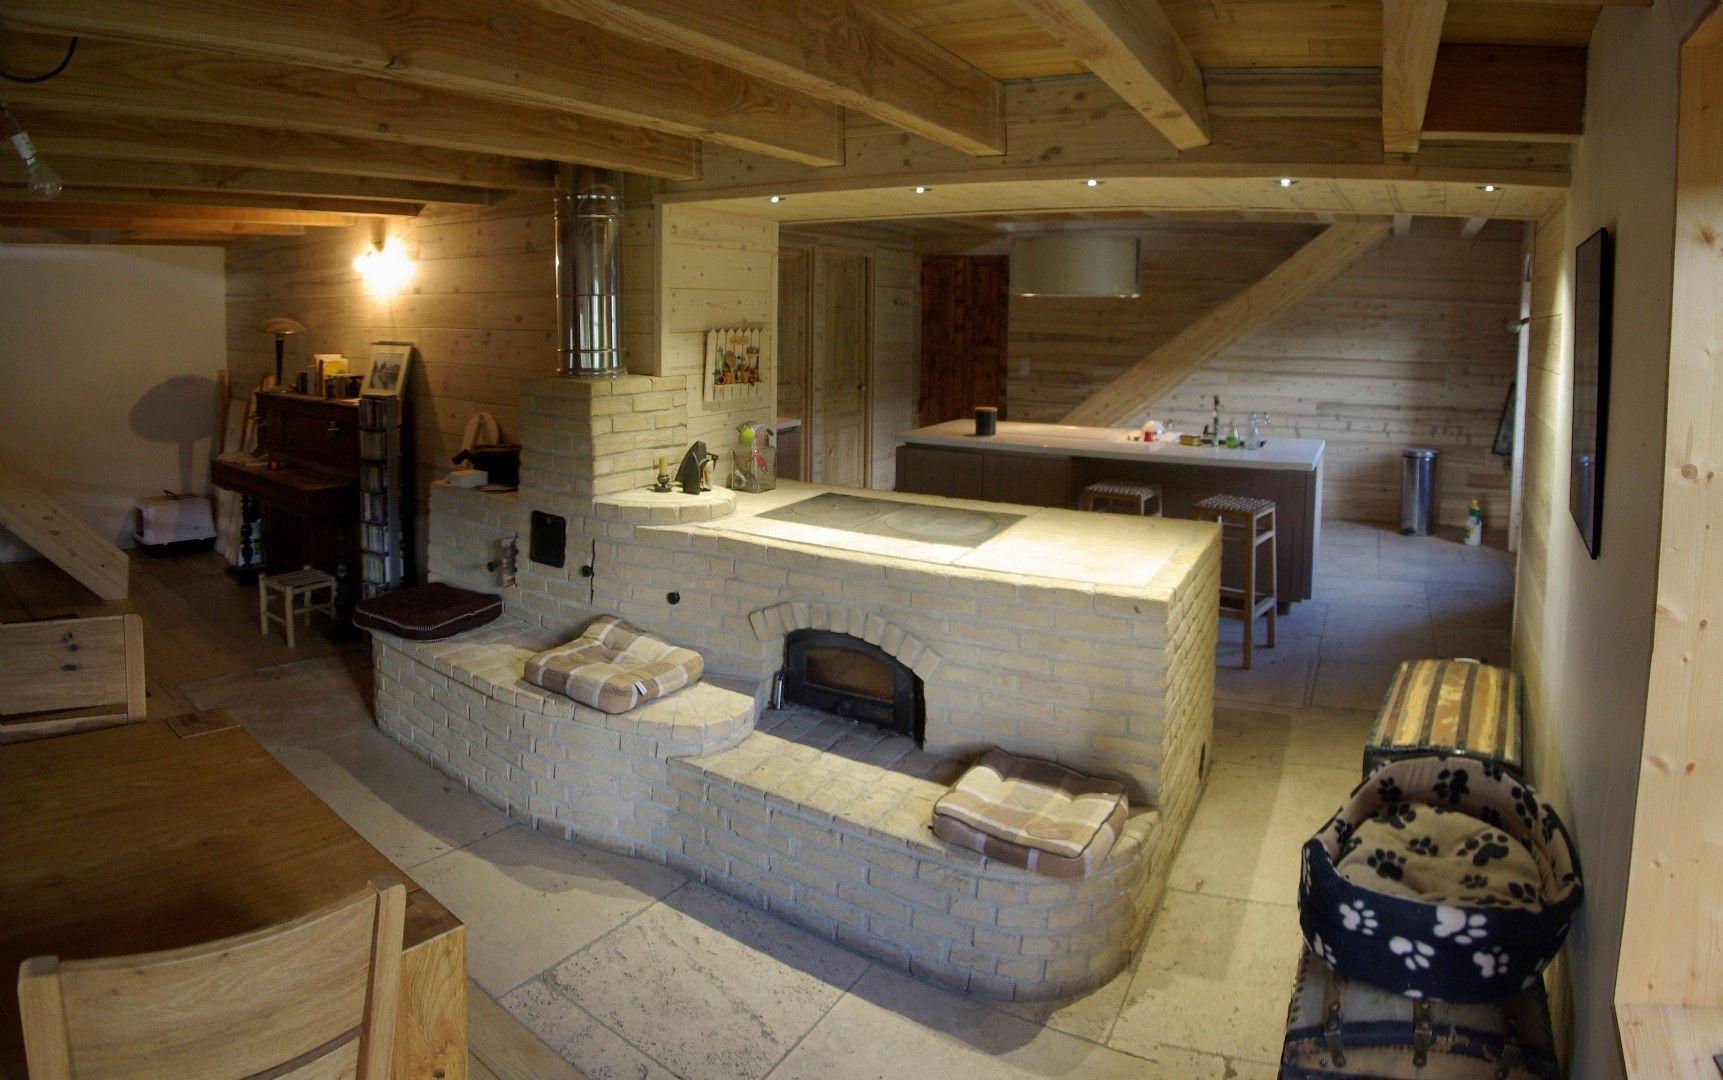 Artisan Poele De Masse poele de masse - cuisiniere de masse | chauffage maison